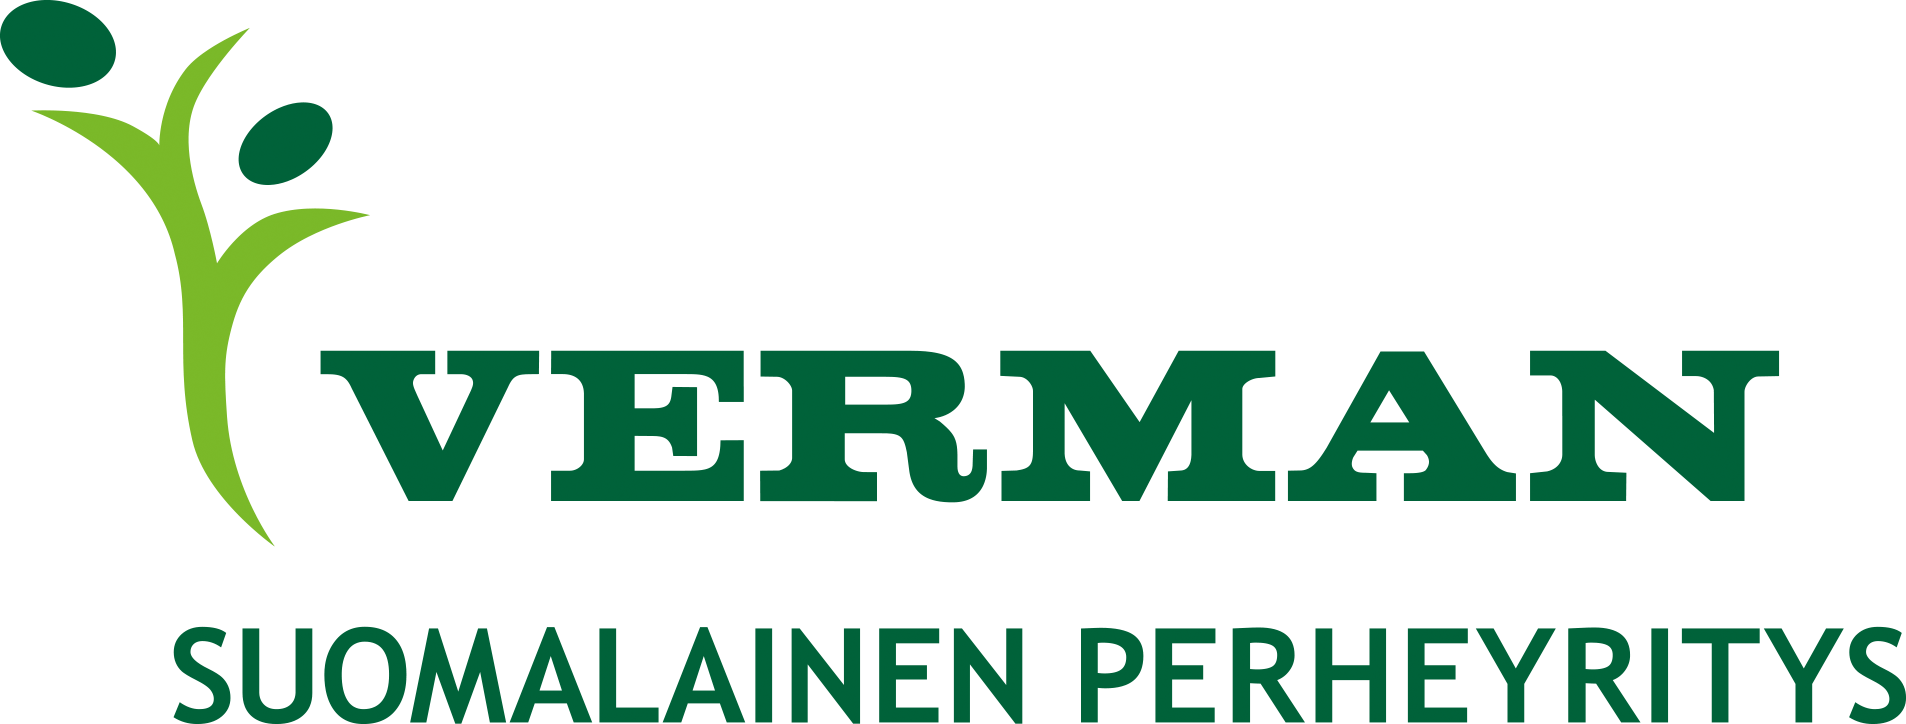 Verman_logo_SuomalainenPerheyritys_RGBweb_iso